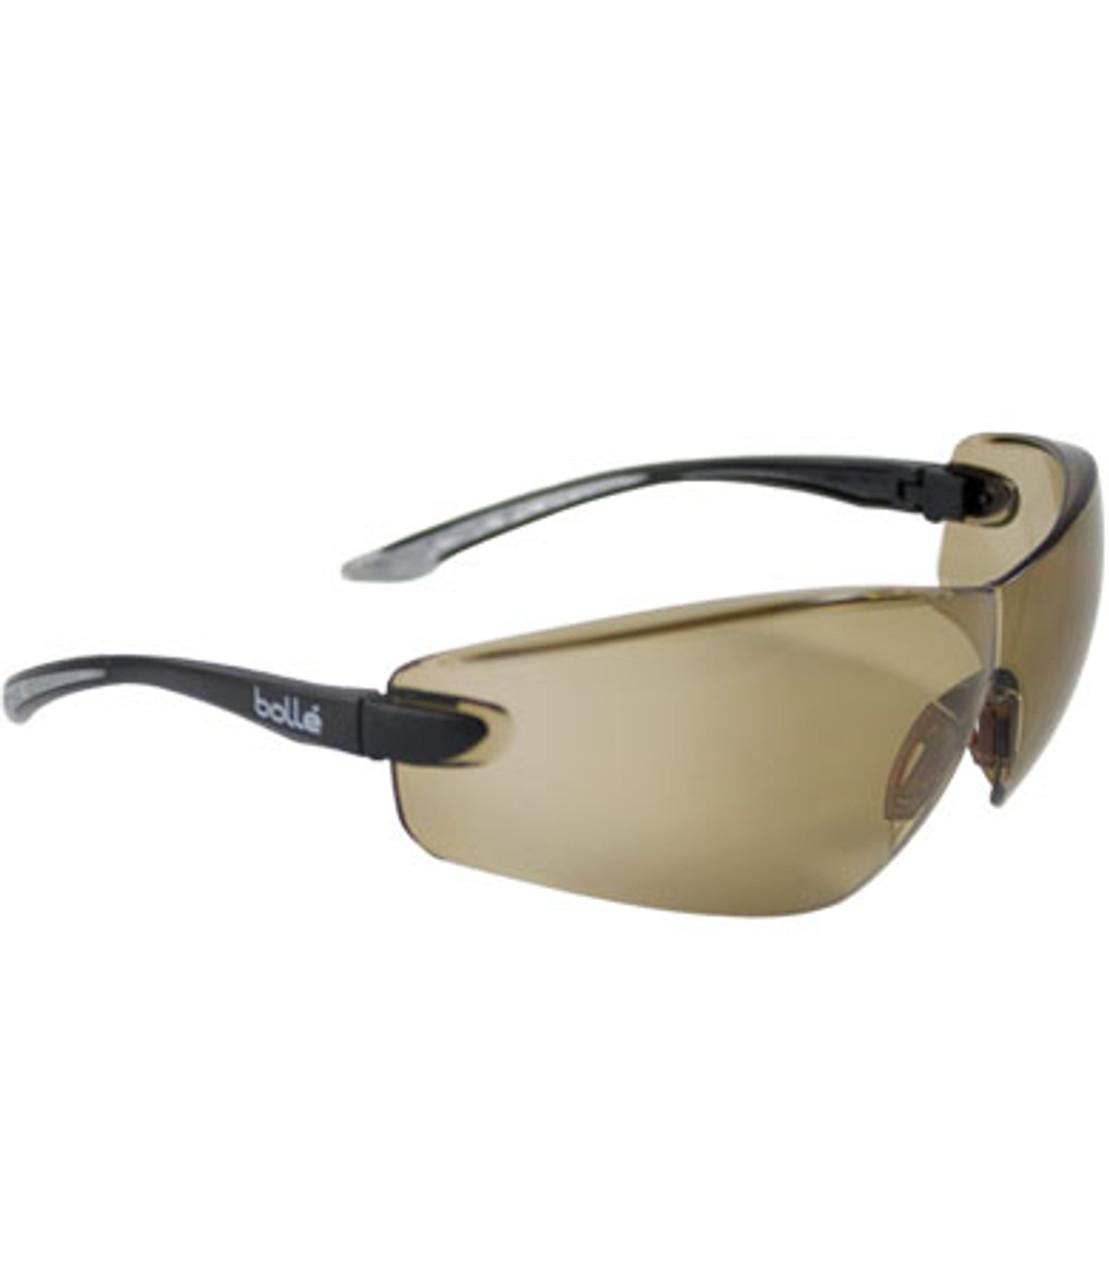 Cobra Eyewear, Smoke Lens, Anti-fog, Anti-scratch